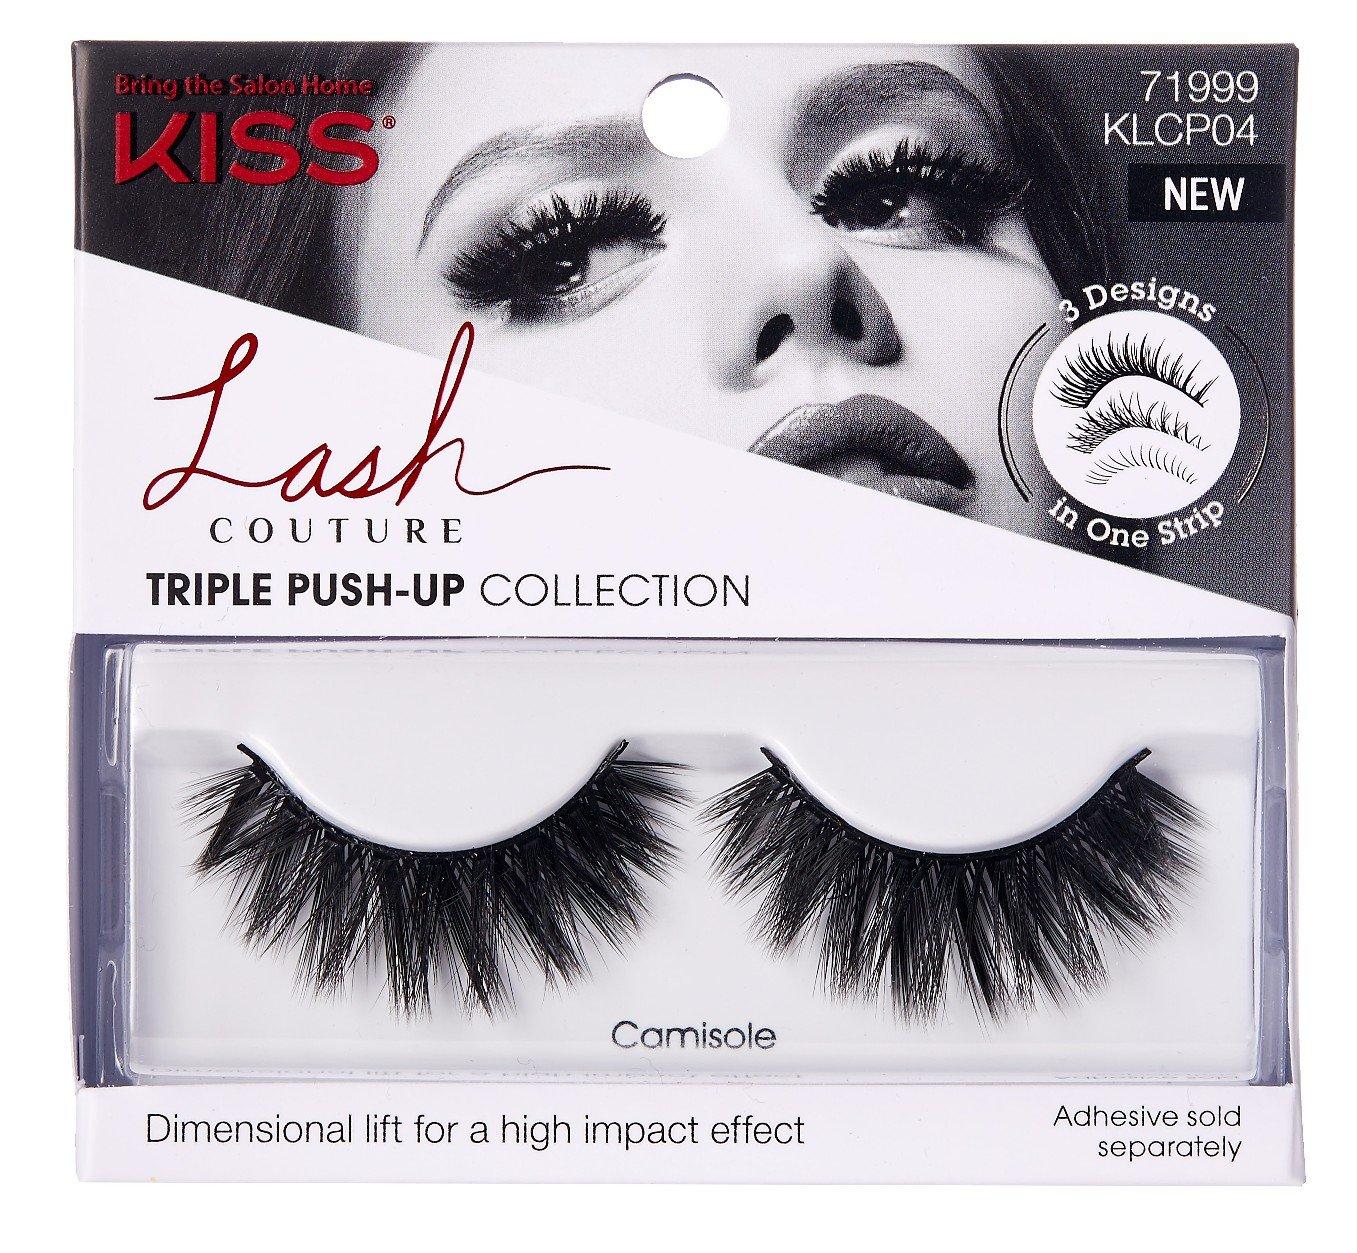 Kiss Lash Couture Triple Push-Up Camisole (6 Pack)